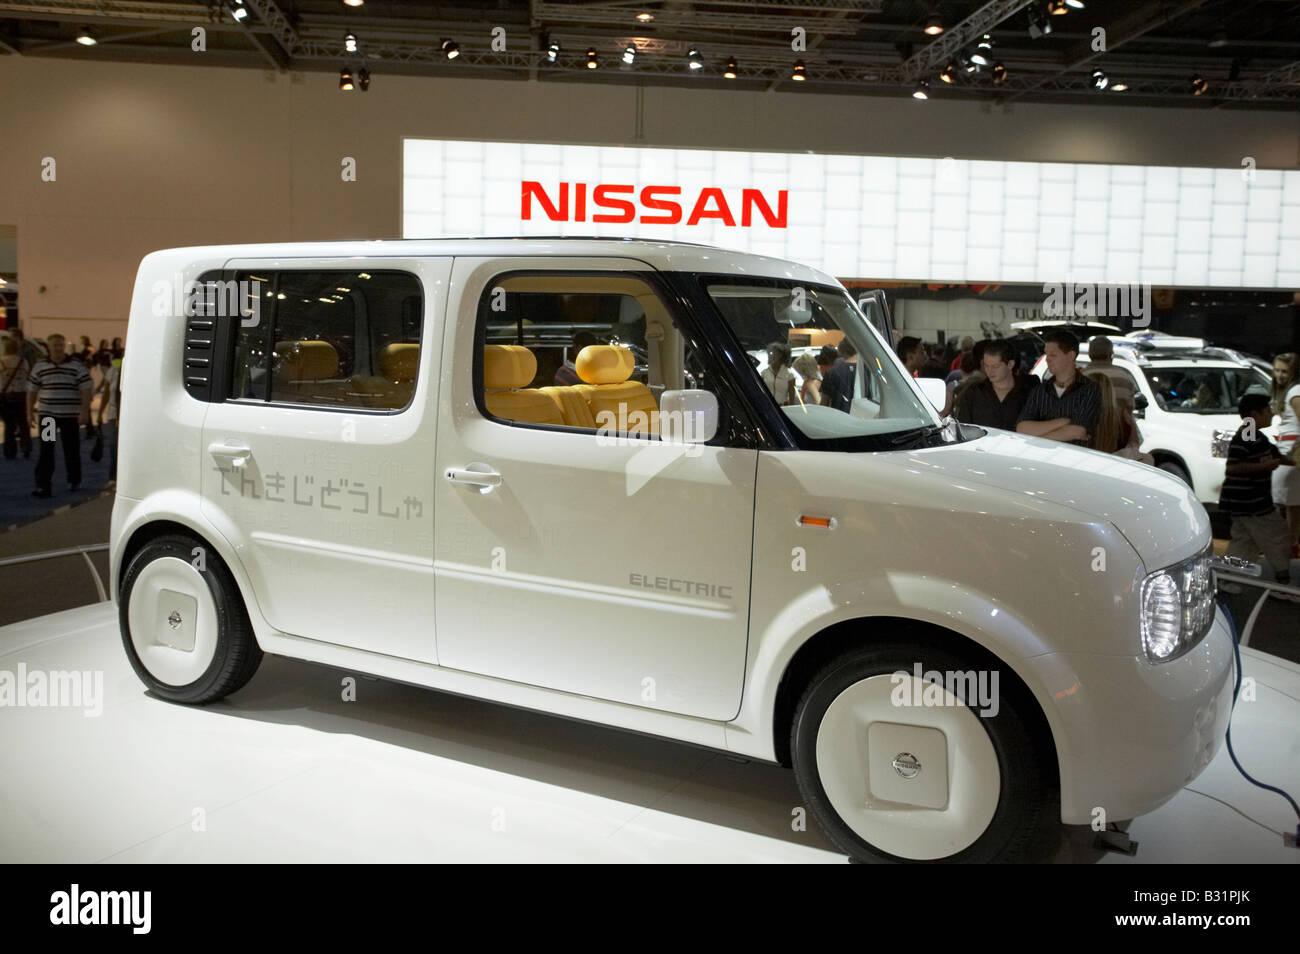 Nissan Garage Rotterdam : Nissan uk stock photos nissan uk stock images alamy